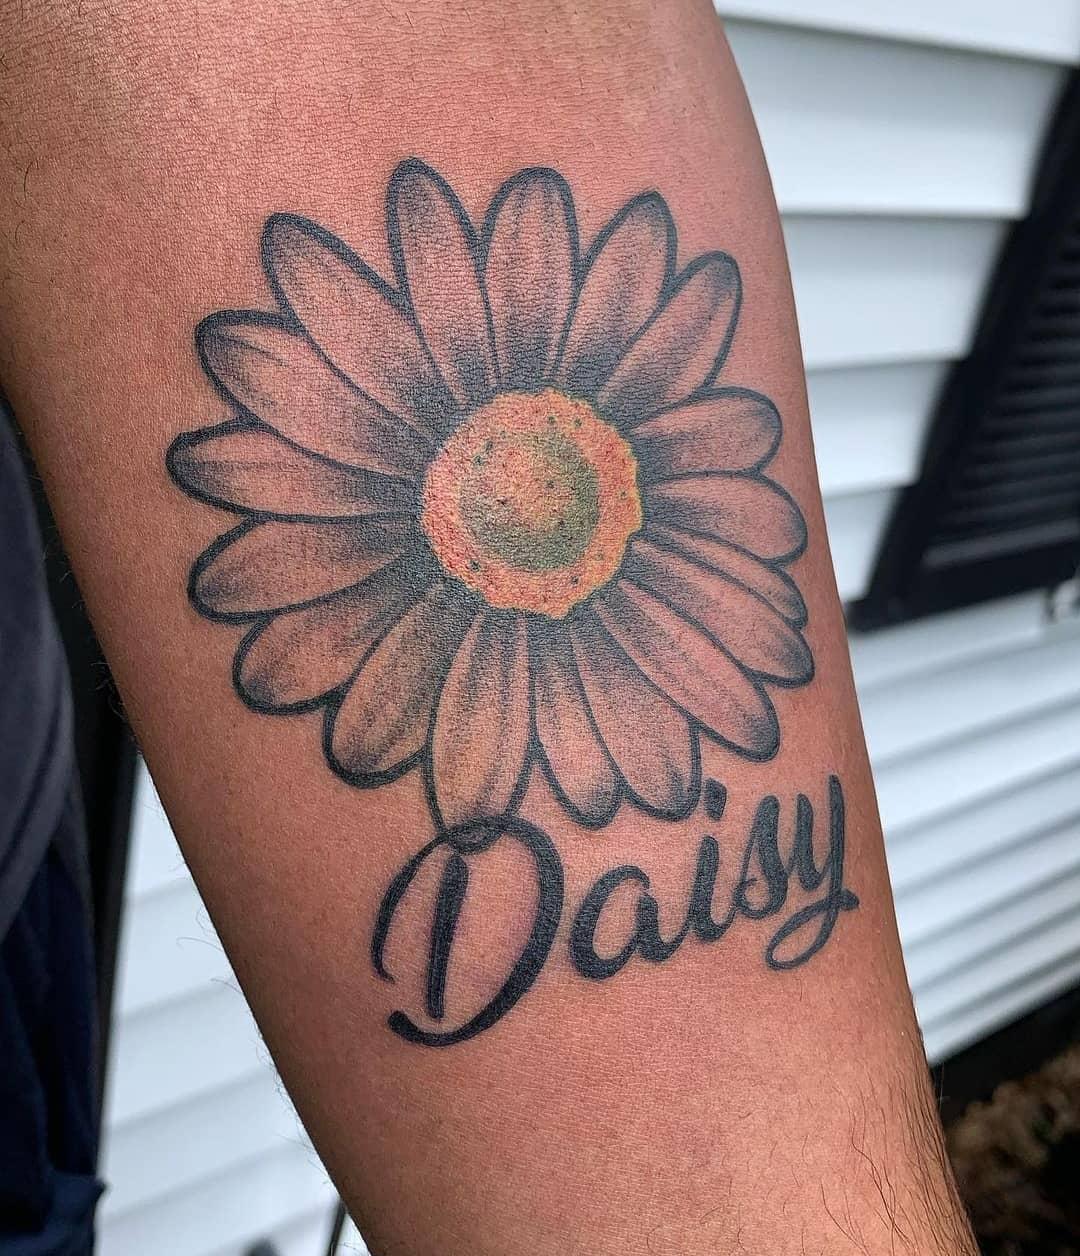 Daisy by Chico Lou's Fine Tattoos studio in Athens Georgia GA. Artist - Darya Kalantari